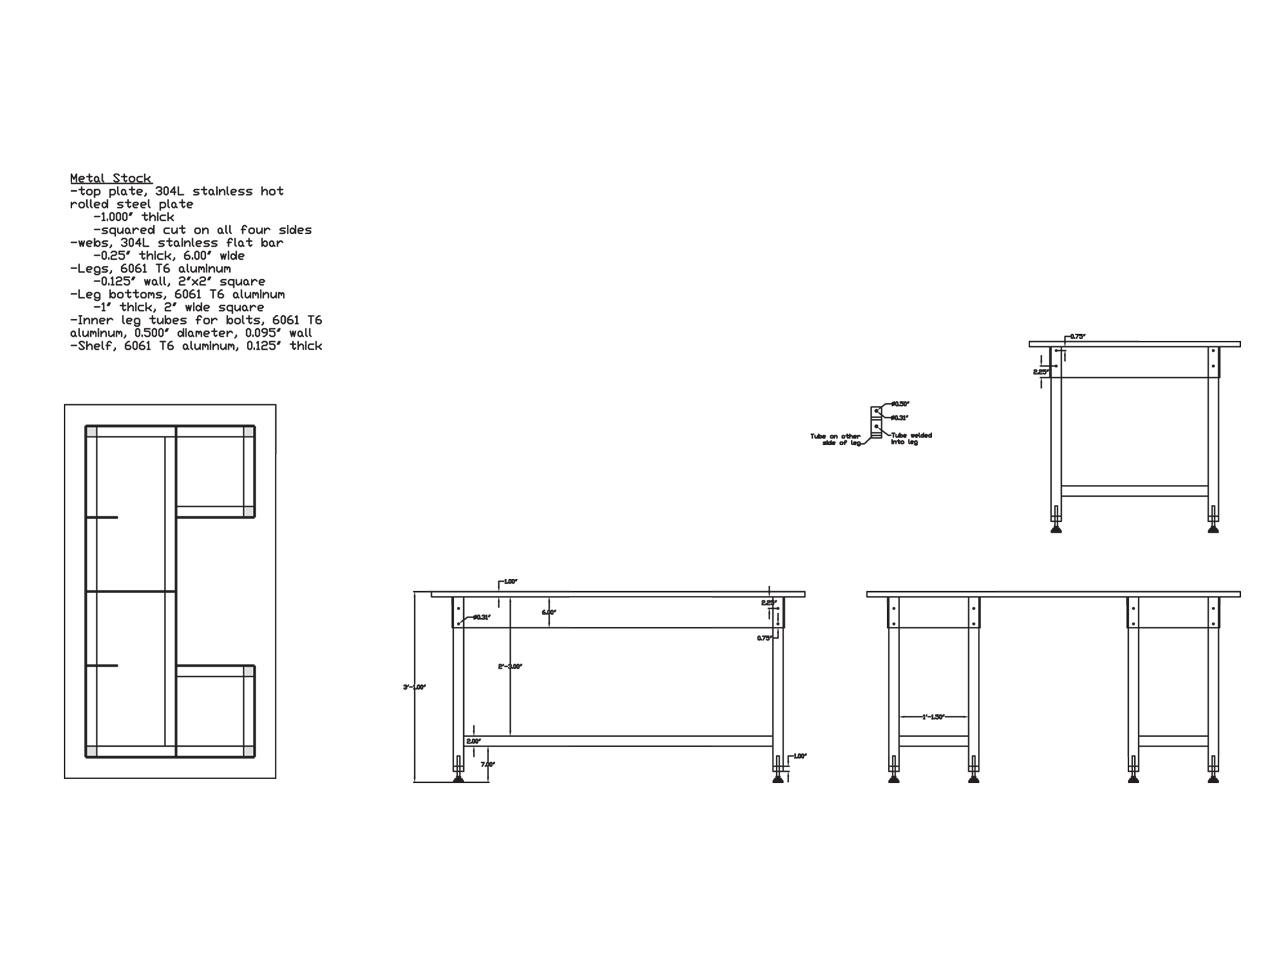 91022d1384538577-welding-table-design-welding-table-drawing-2.jpg